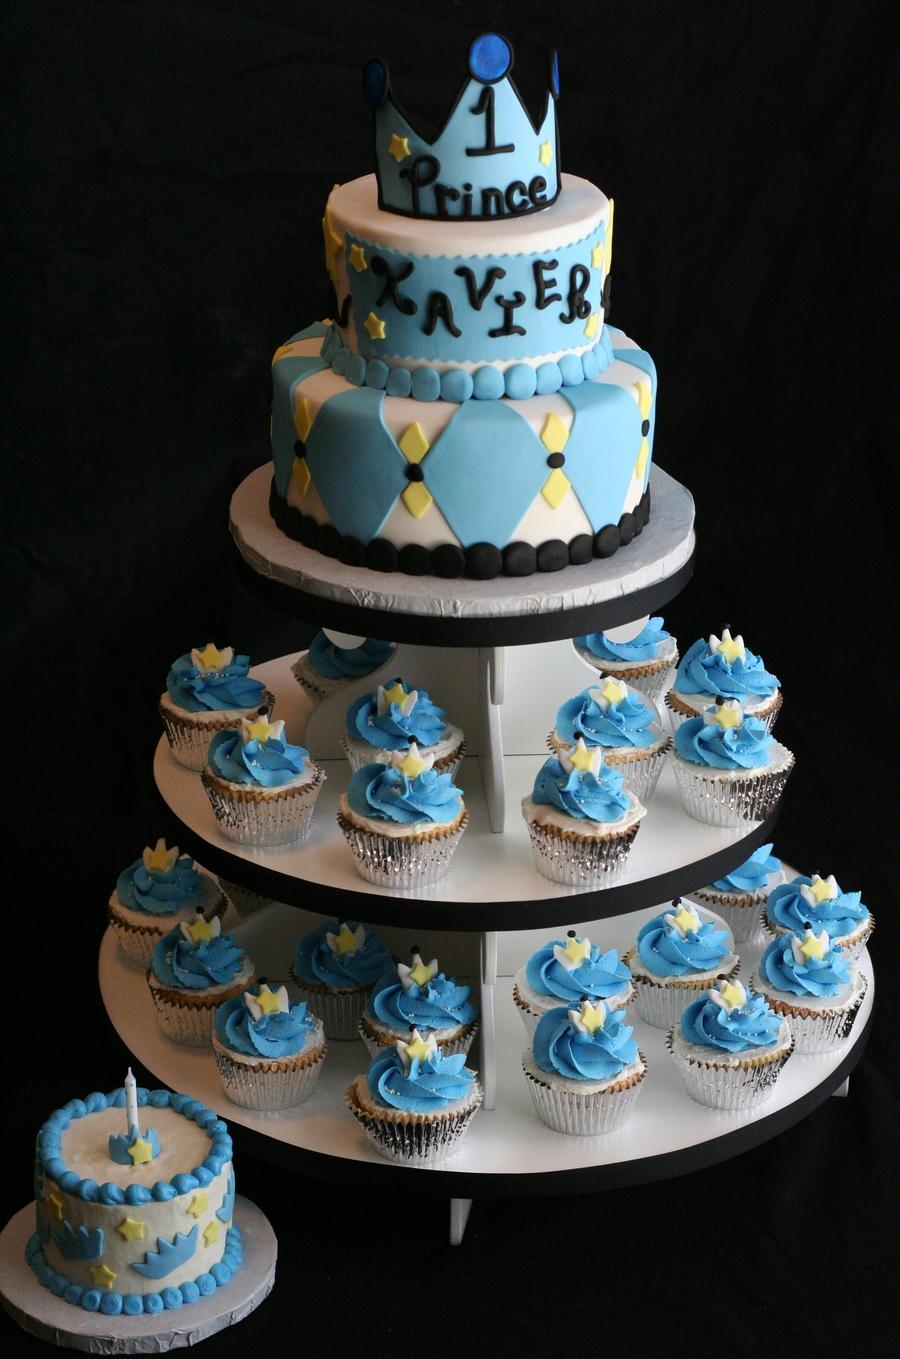 Prince Theme 1st Birthday Cakes for Boys